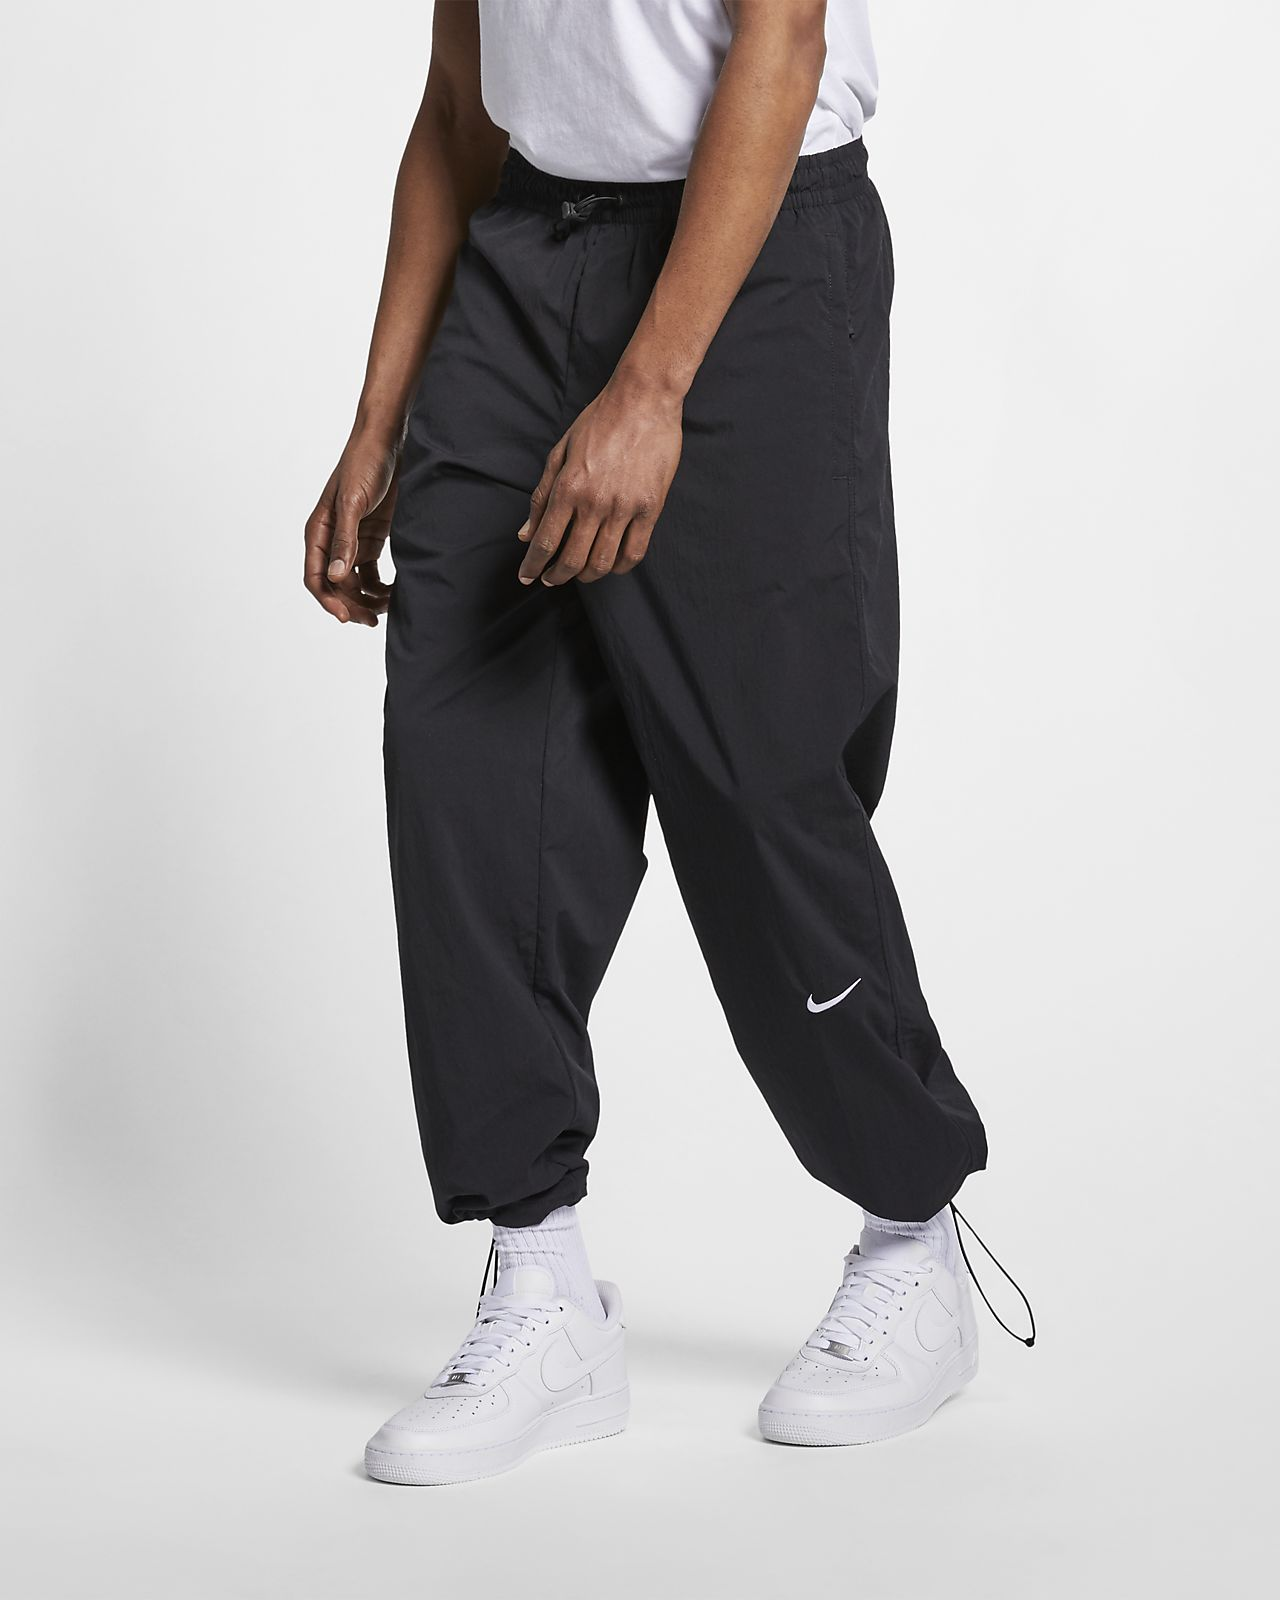 Pantalon NikeLab Collection pour Homme